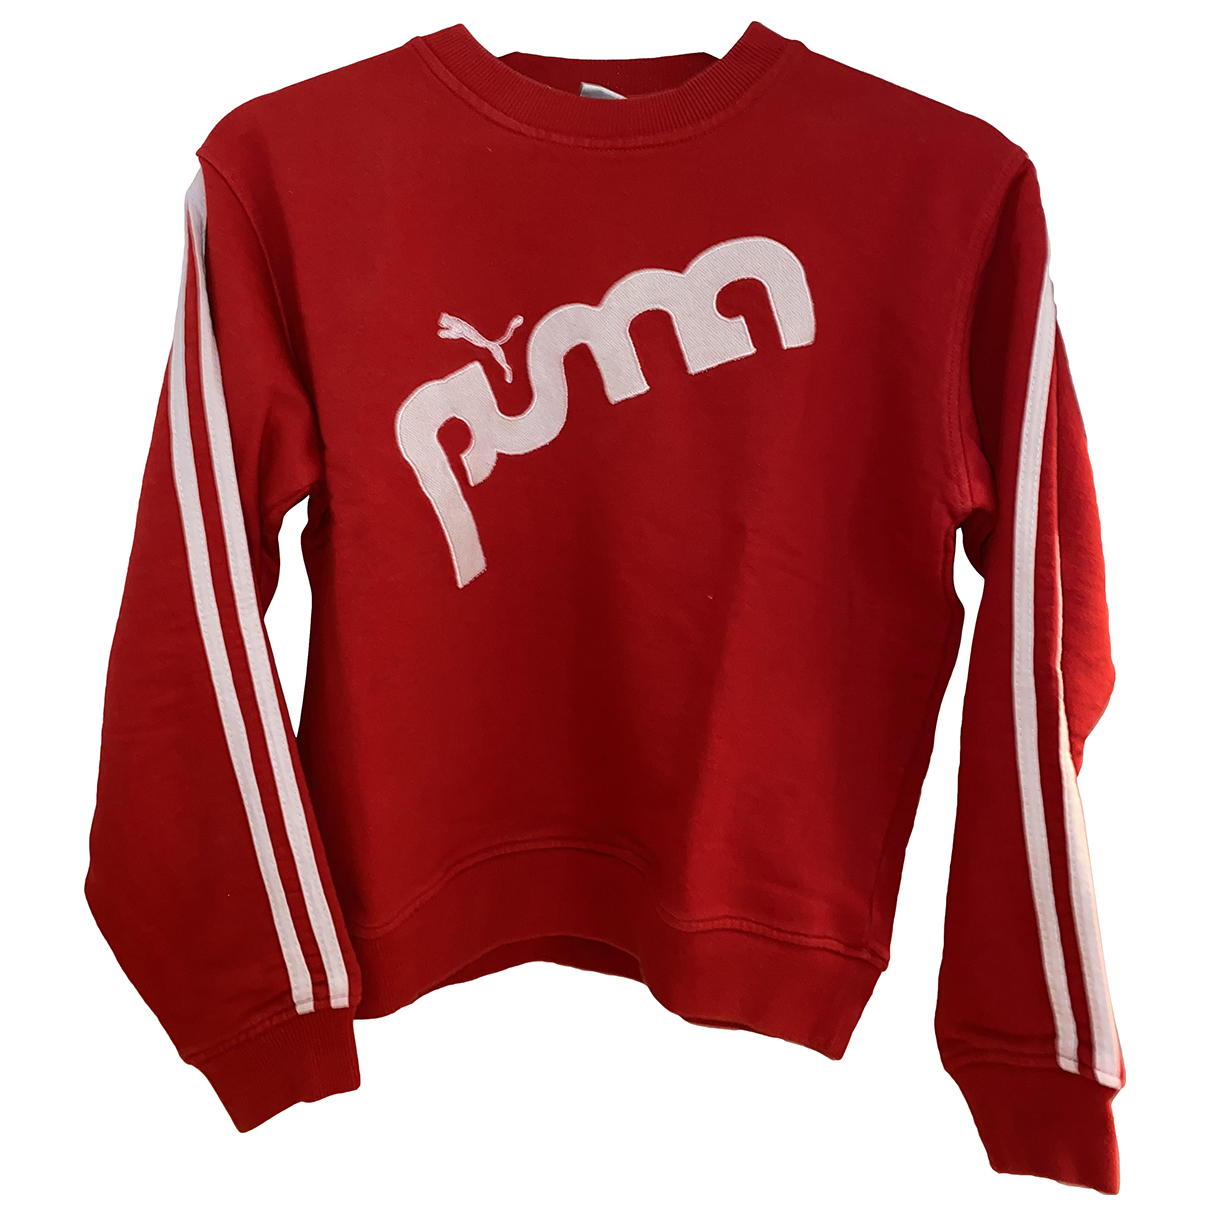 Puma N Red Cotton Knitwear for Women S International